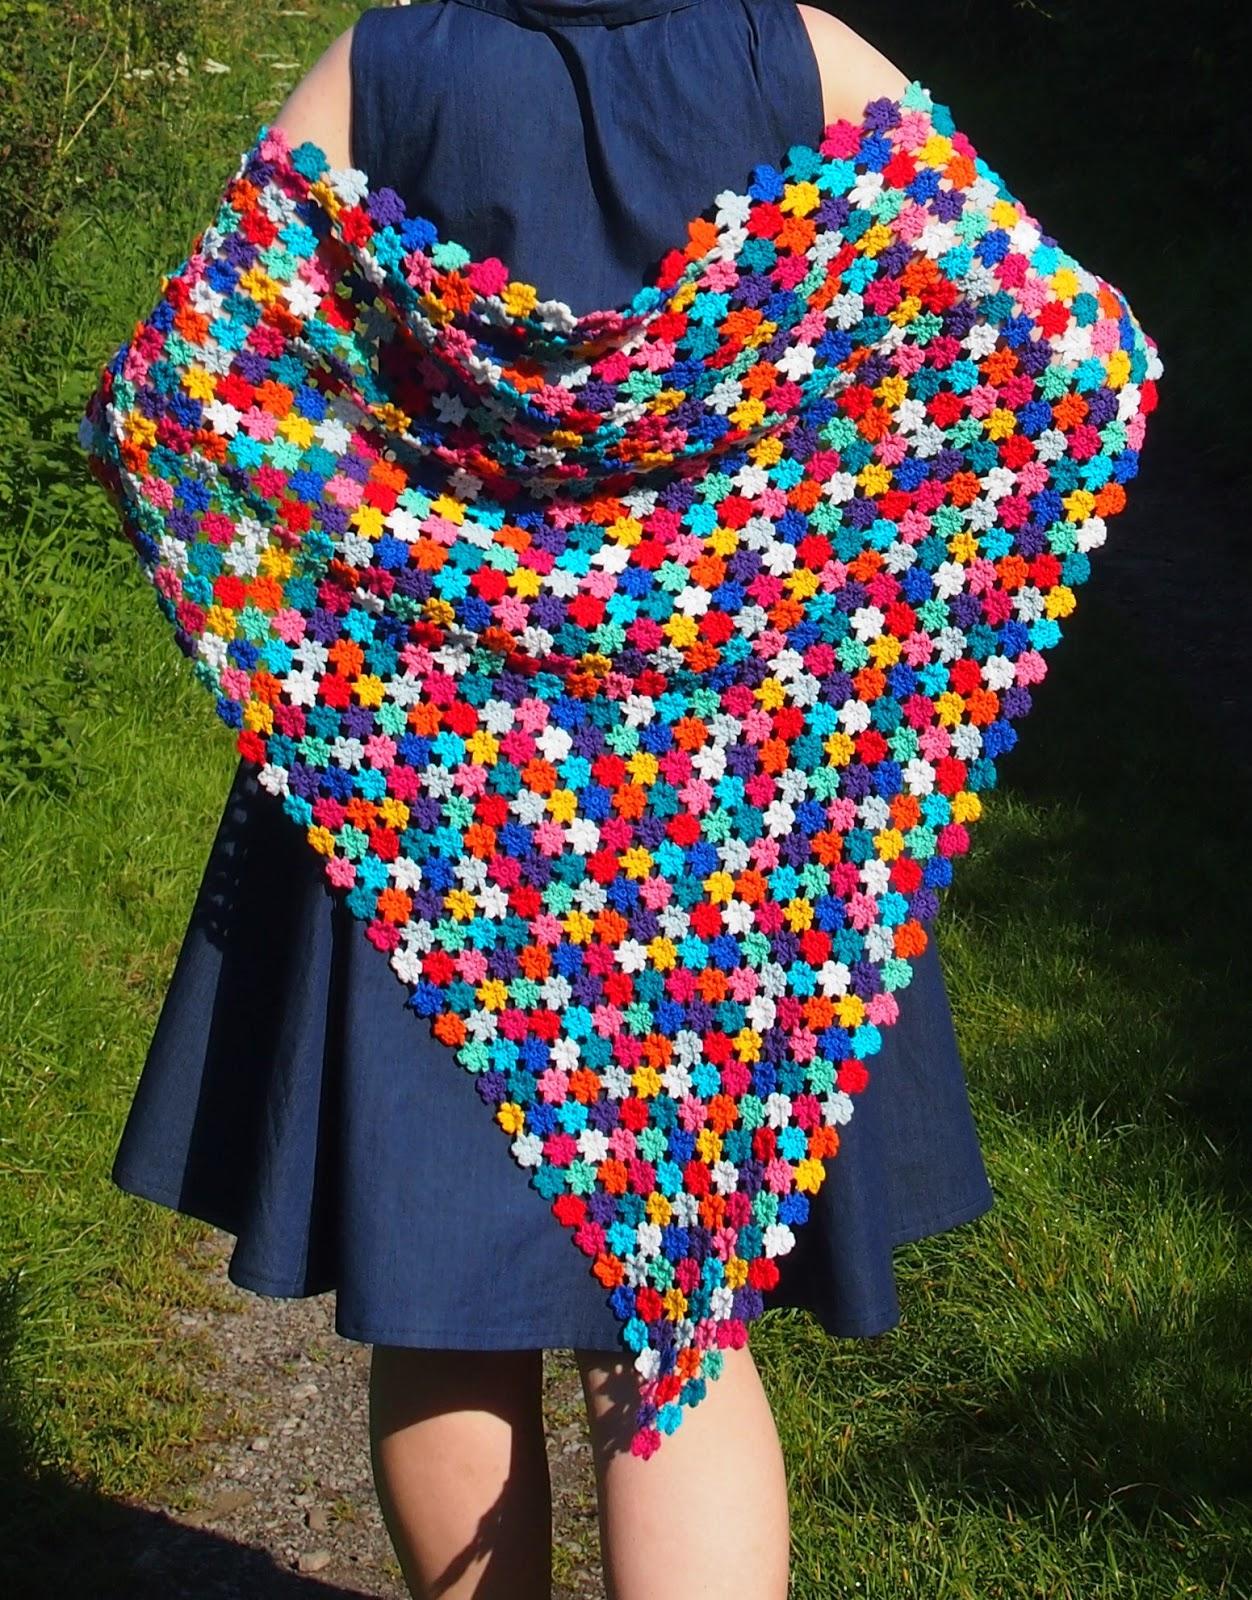 Crochet Floral Shawl Pattern : Nightingale & Dolittle: Crochet: Amazing Technicolour ...